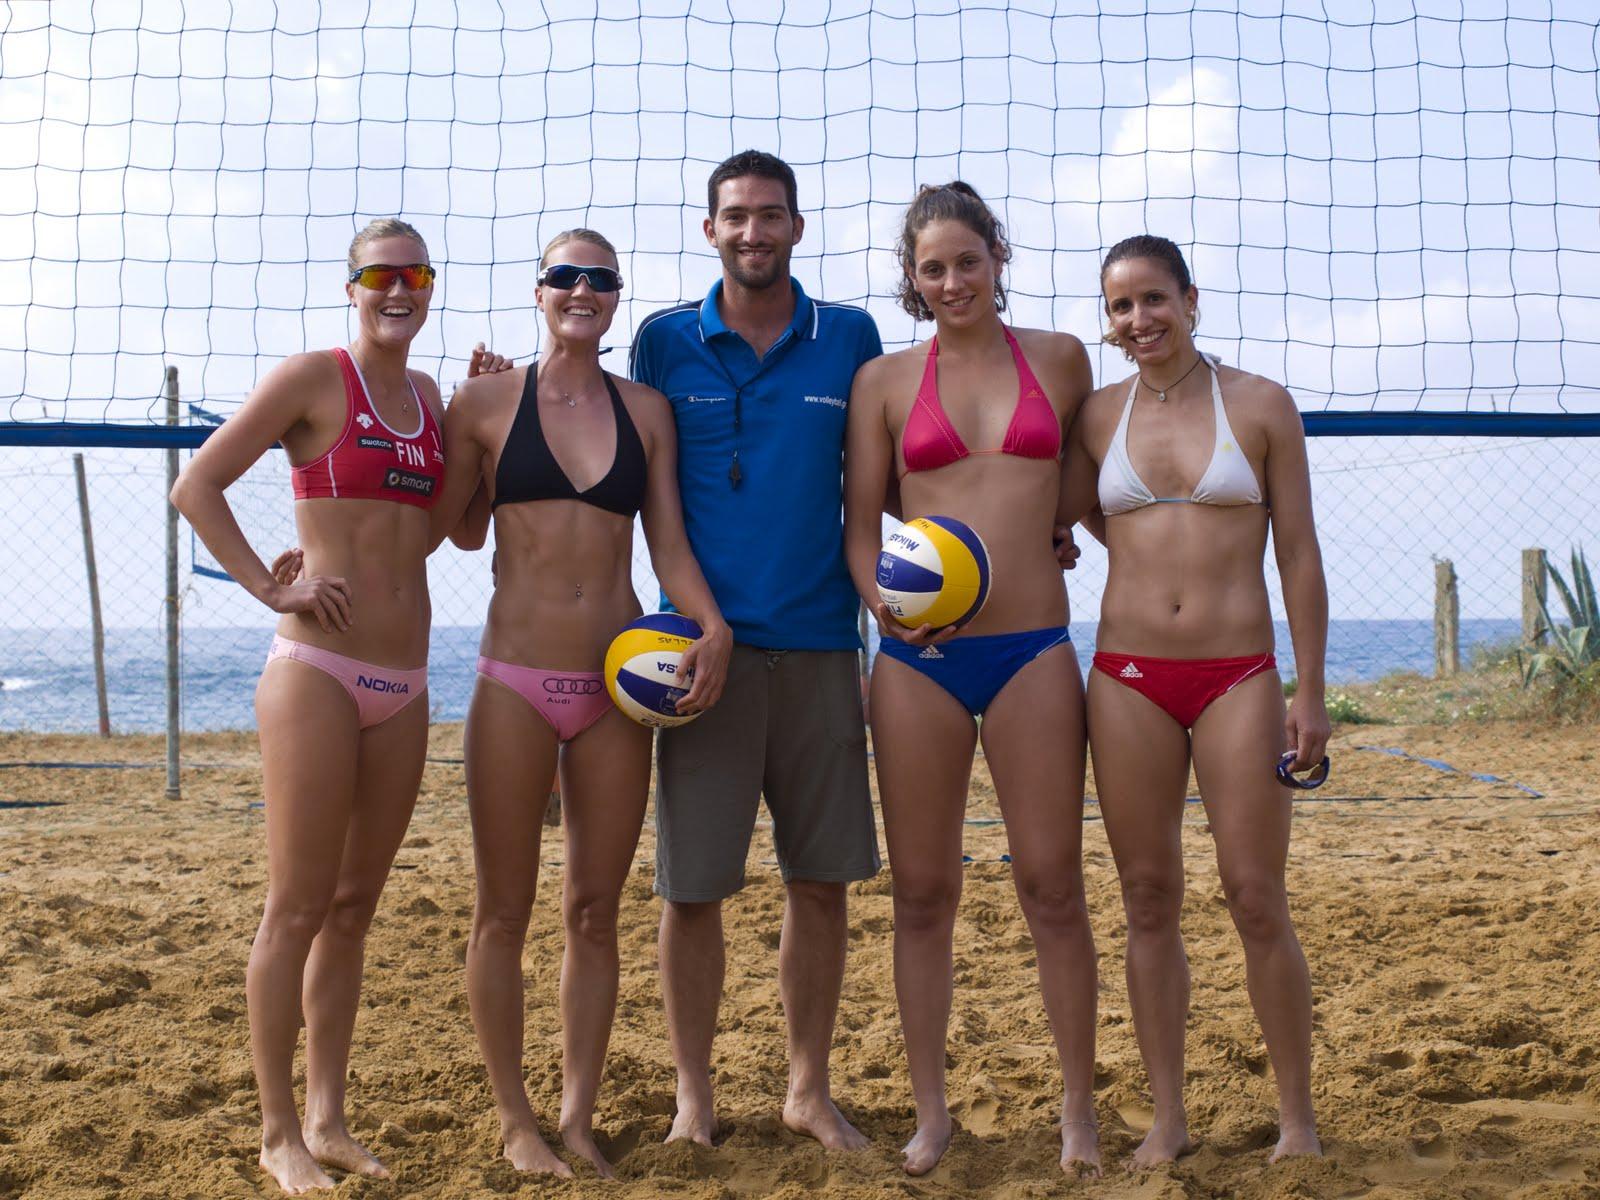 National Teams training at Chania Beach Volleyball Club, 2013